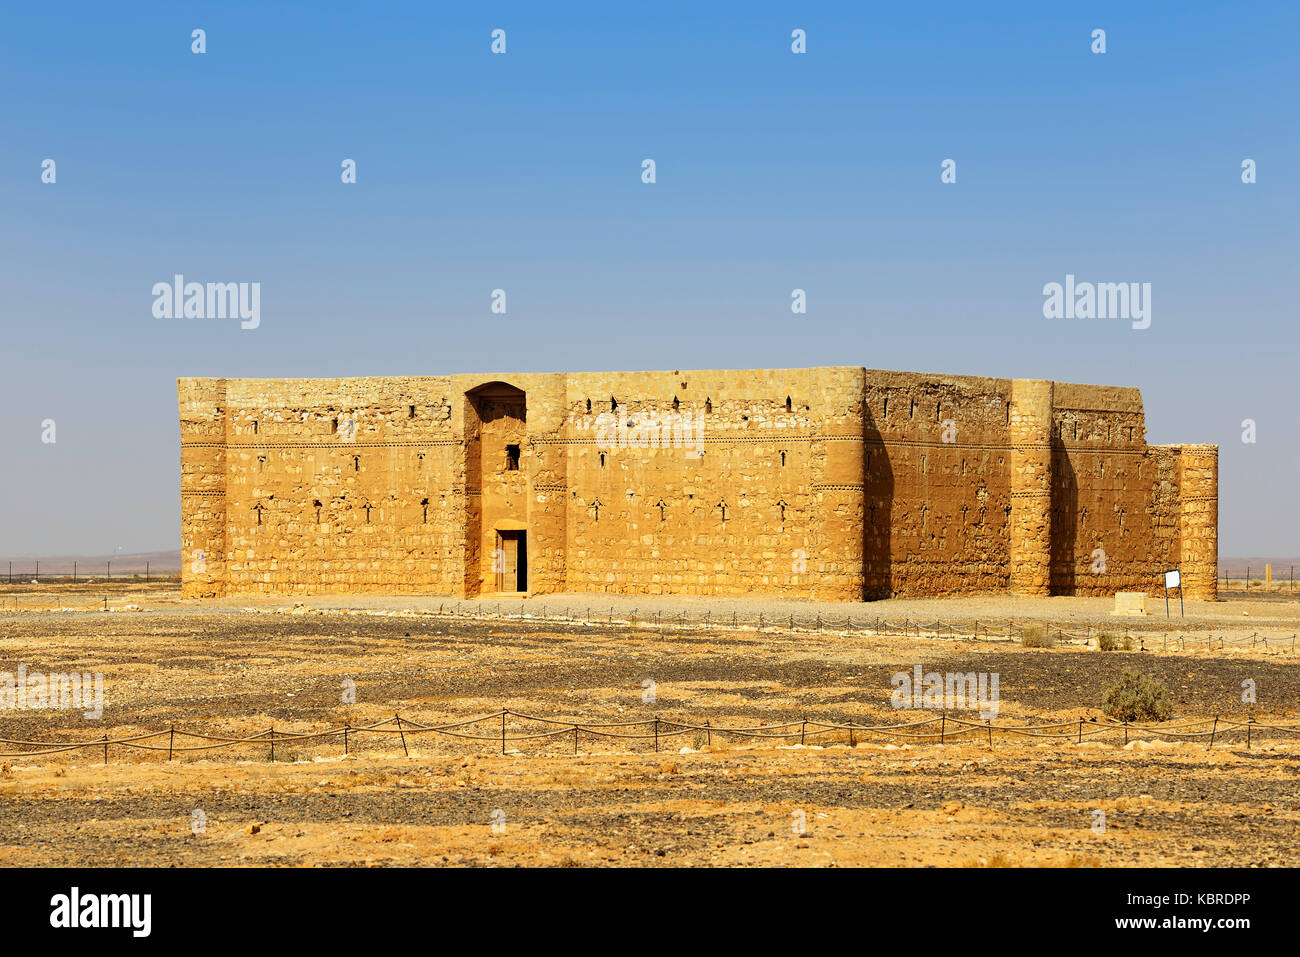 Umayyad desert castle, Qasr Al-Kharanah, Jordan - Stock Image